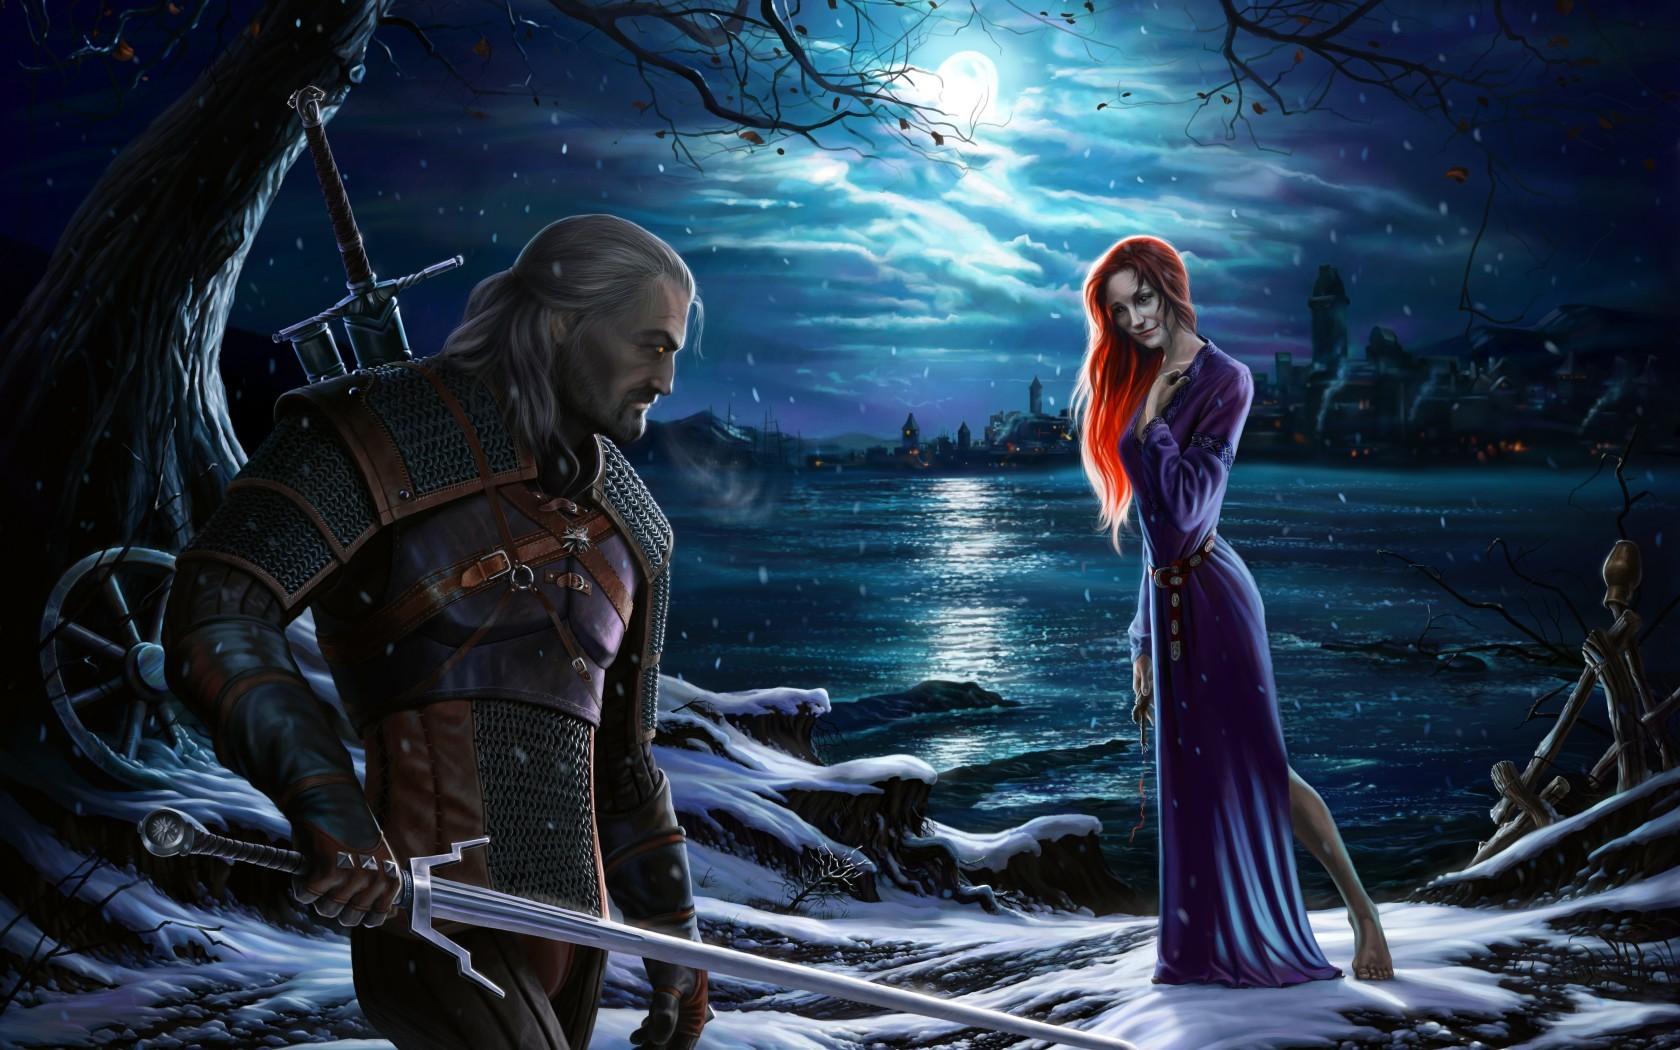 The Witcher 3 Wallpaper 4k: The Witcher 3 Wild Hunt Amazing Art, HD Artist, 4k